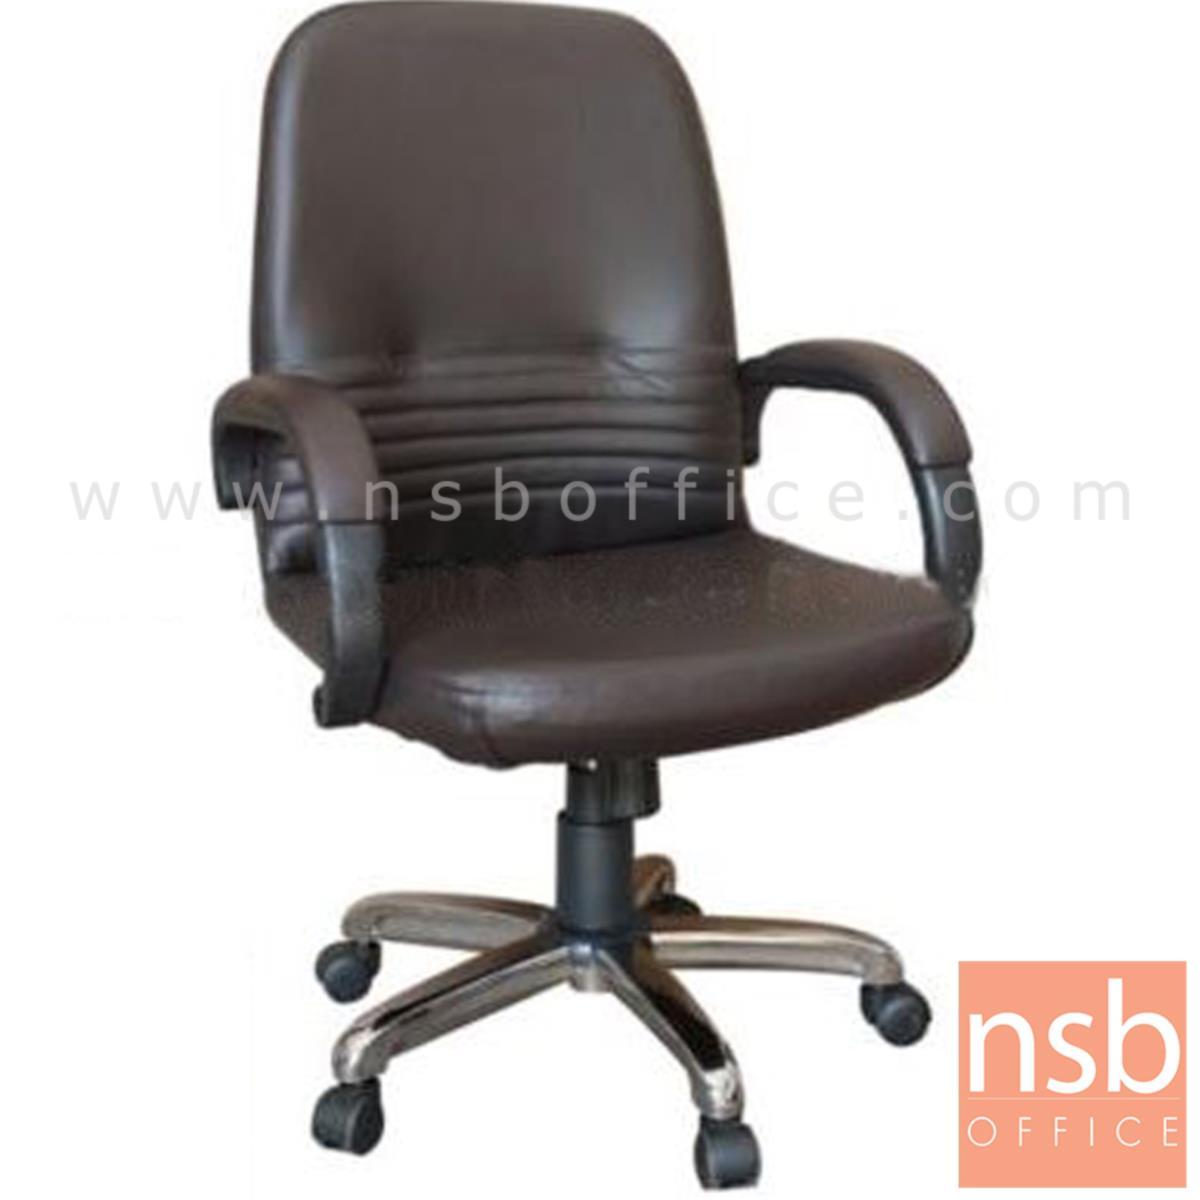 B03A088:เก้าอี้สำนักงาน รุ่น Saffron (เซฟฟรอน)  โช๊คแก๊ส มีก้อนโยก ขาเหล็กชุบโครเมี่ยม